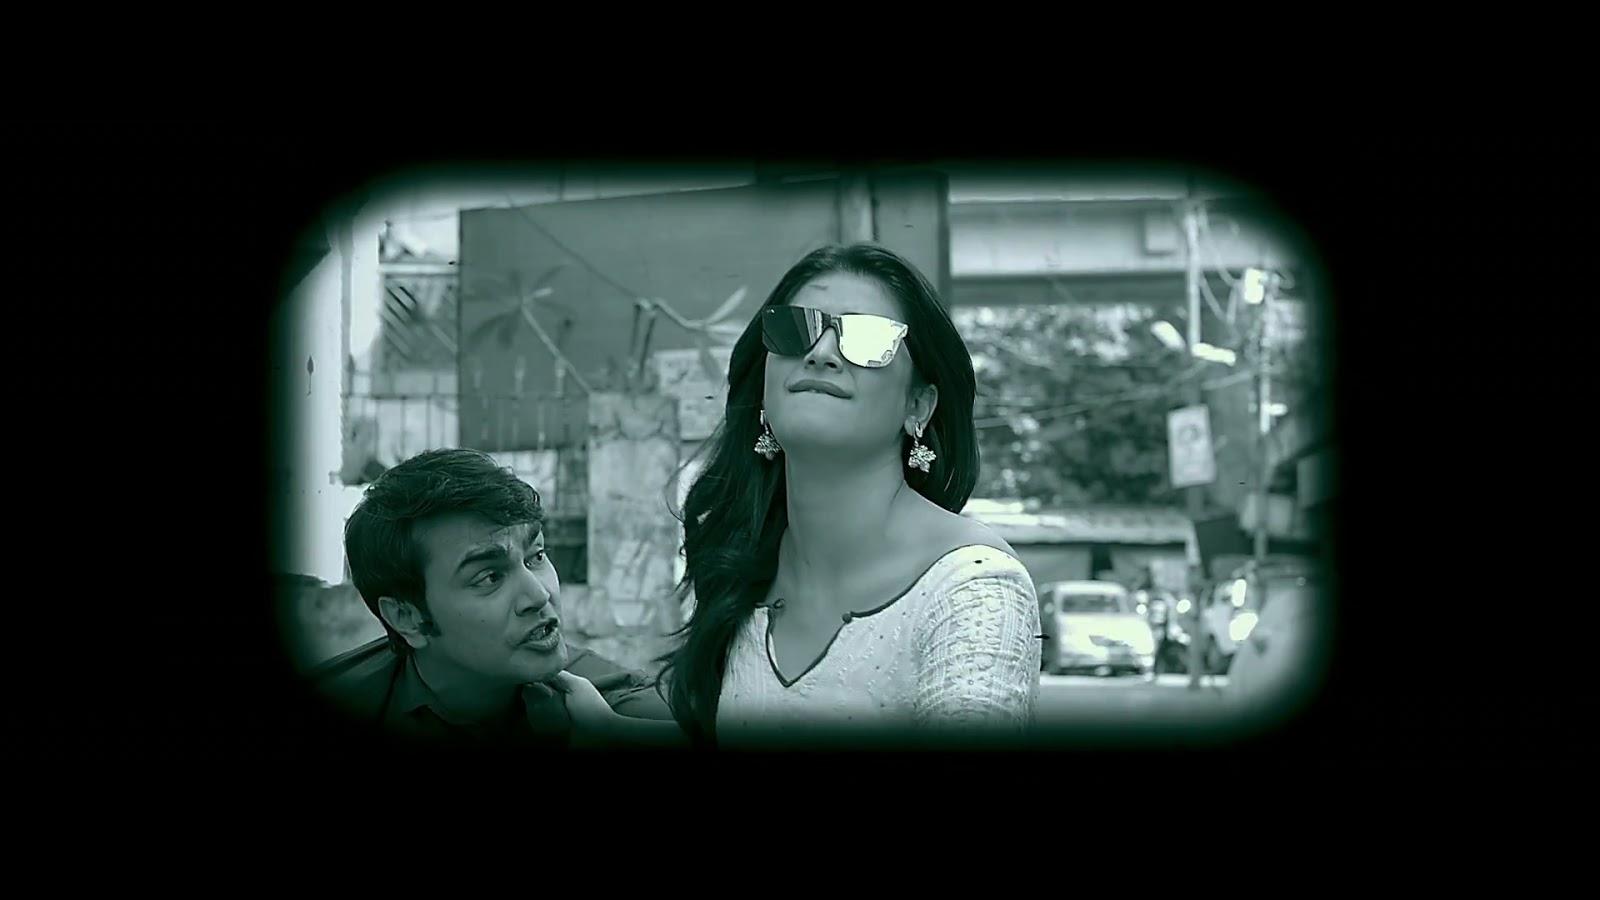 shruti haasan bollywood actress hd wallpapers 1080p